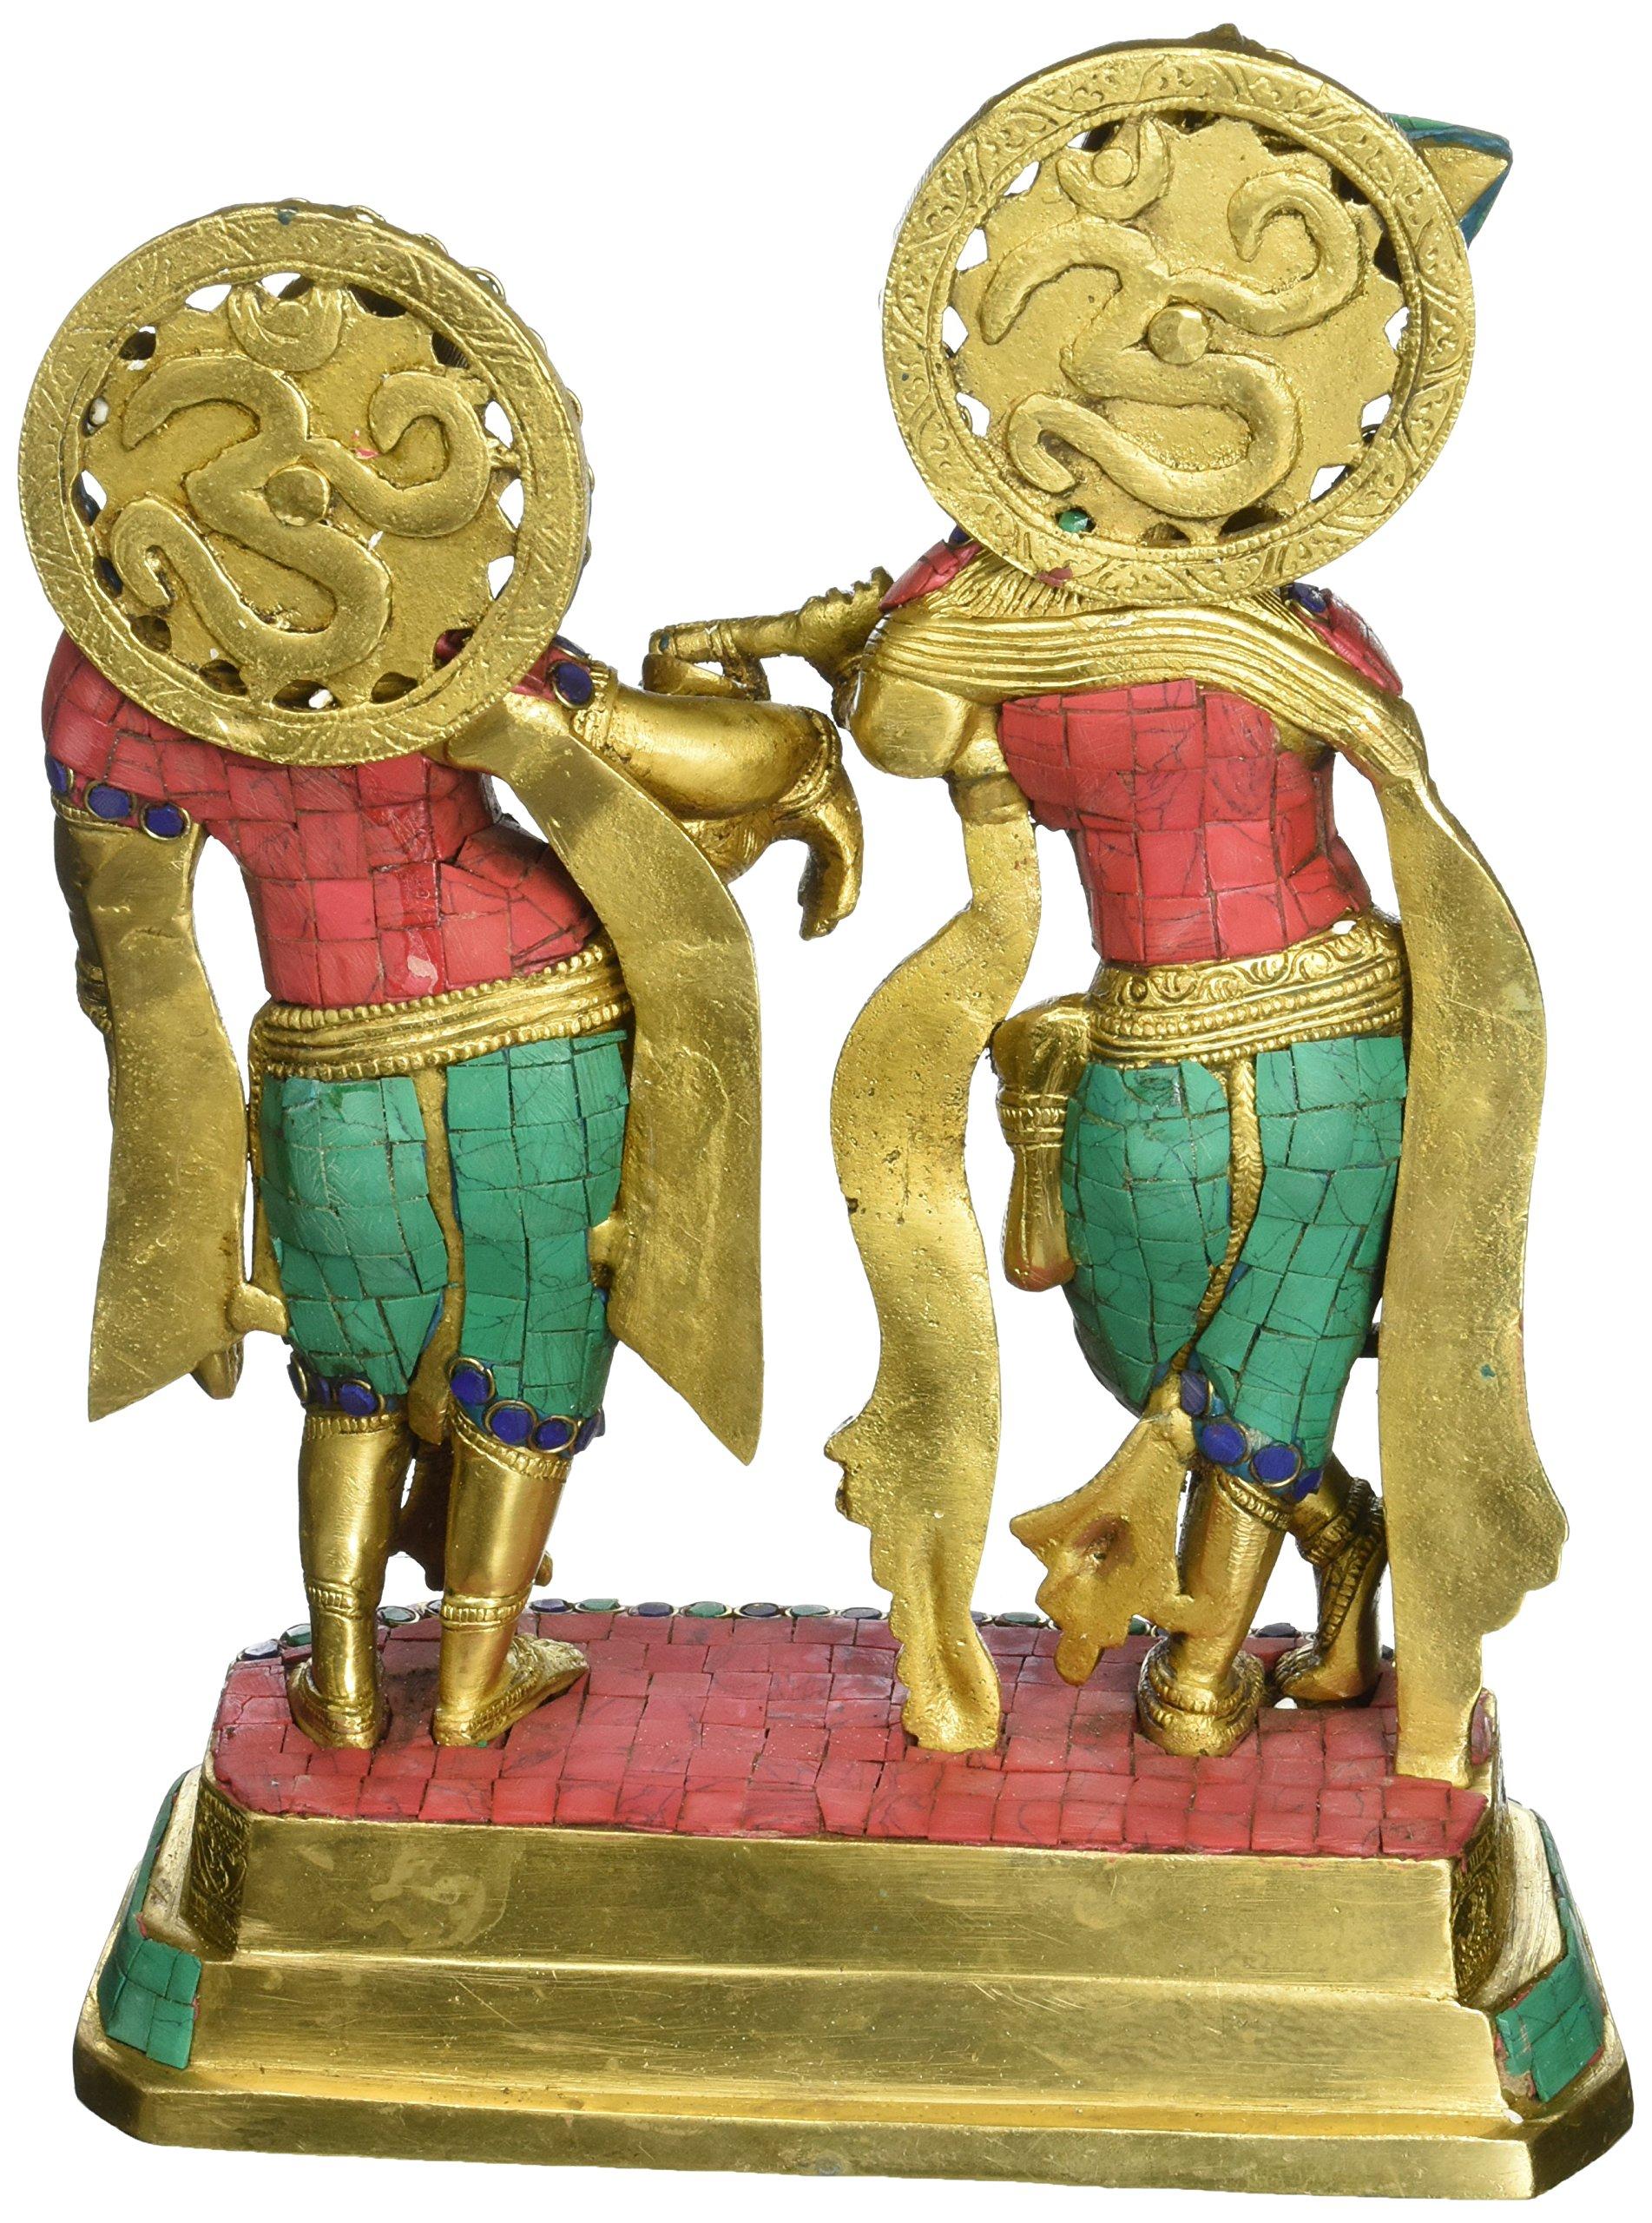 AapnoCraft Large Standing Radha Krishna Statue - Exquisite Divine Couple Radha Krishna Idols Symbol of Love Sculpture Wedding Gifts by AapnoCraft (Image #2)